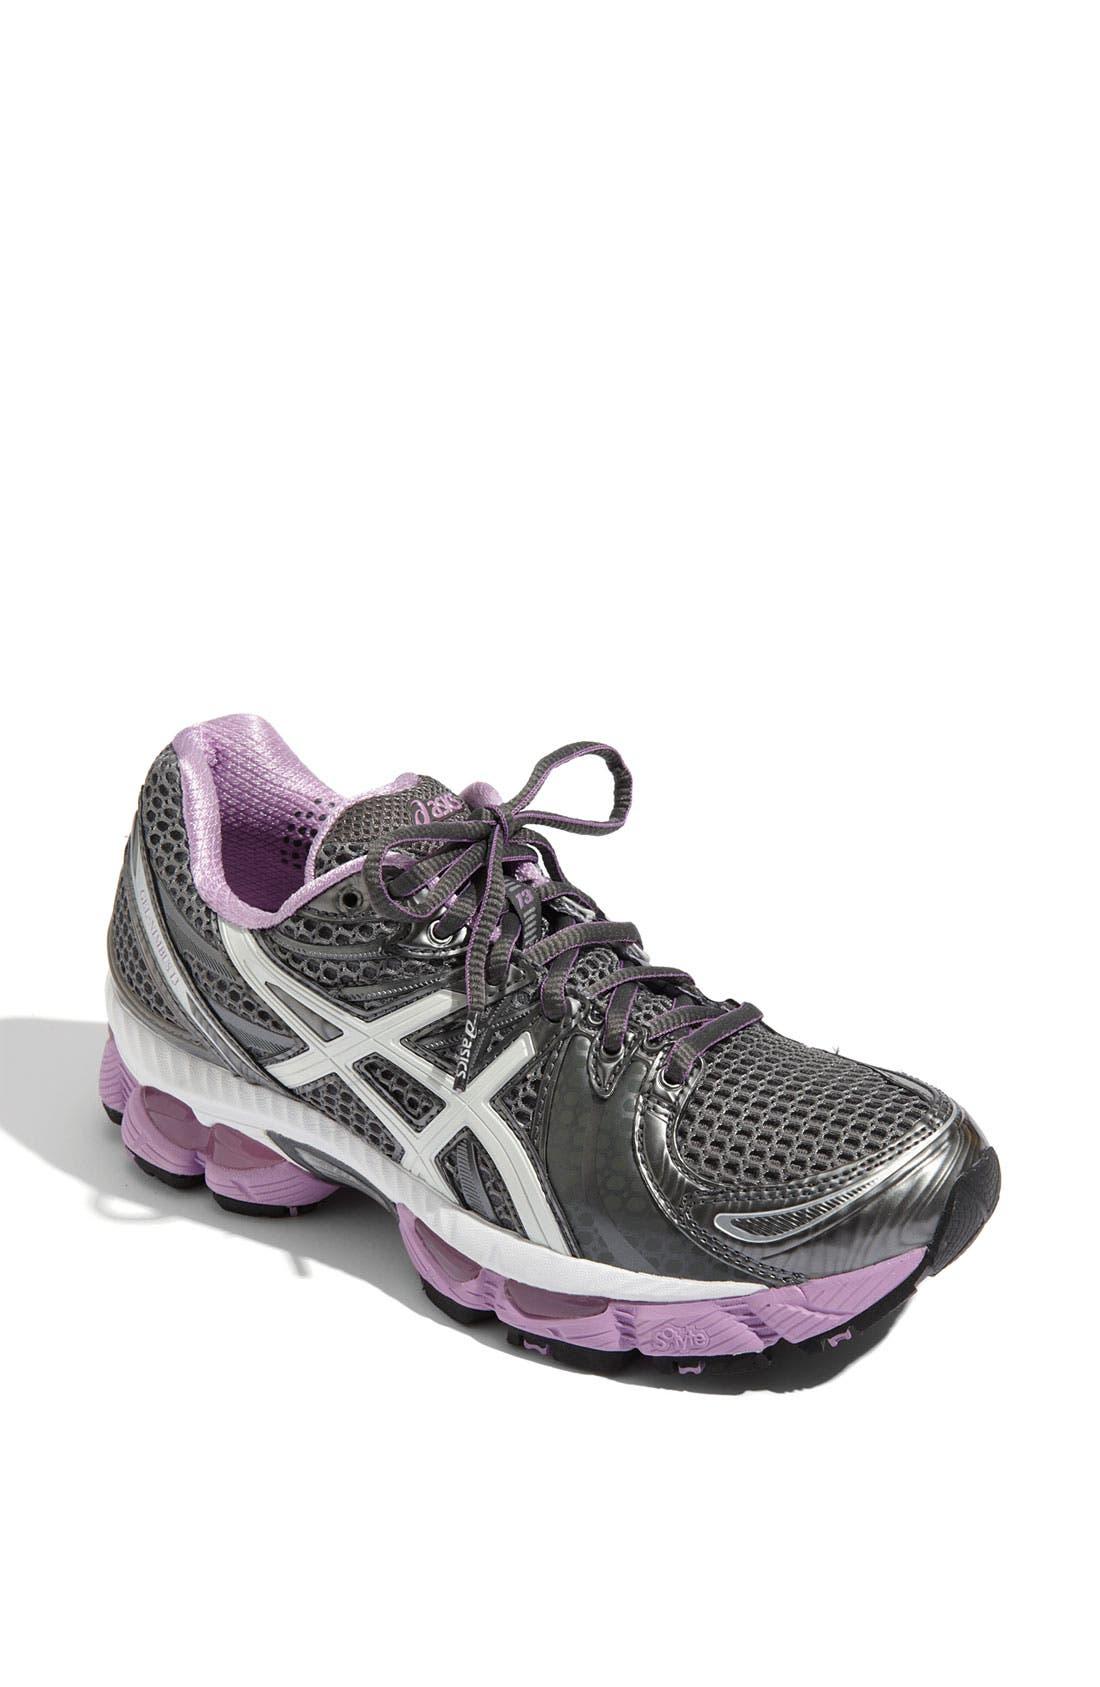 Main Image - ASICS® 'GEL-Nimbus® 13' Running Shoe (Women)